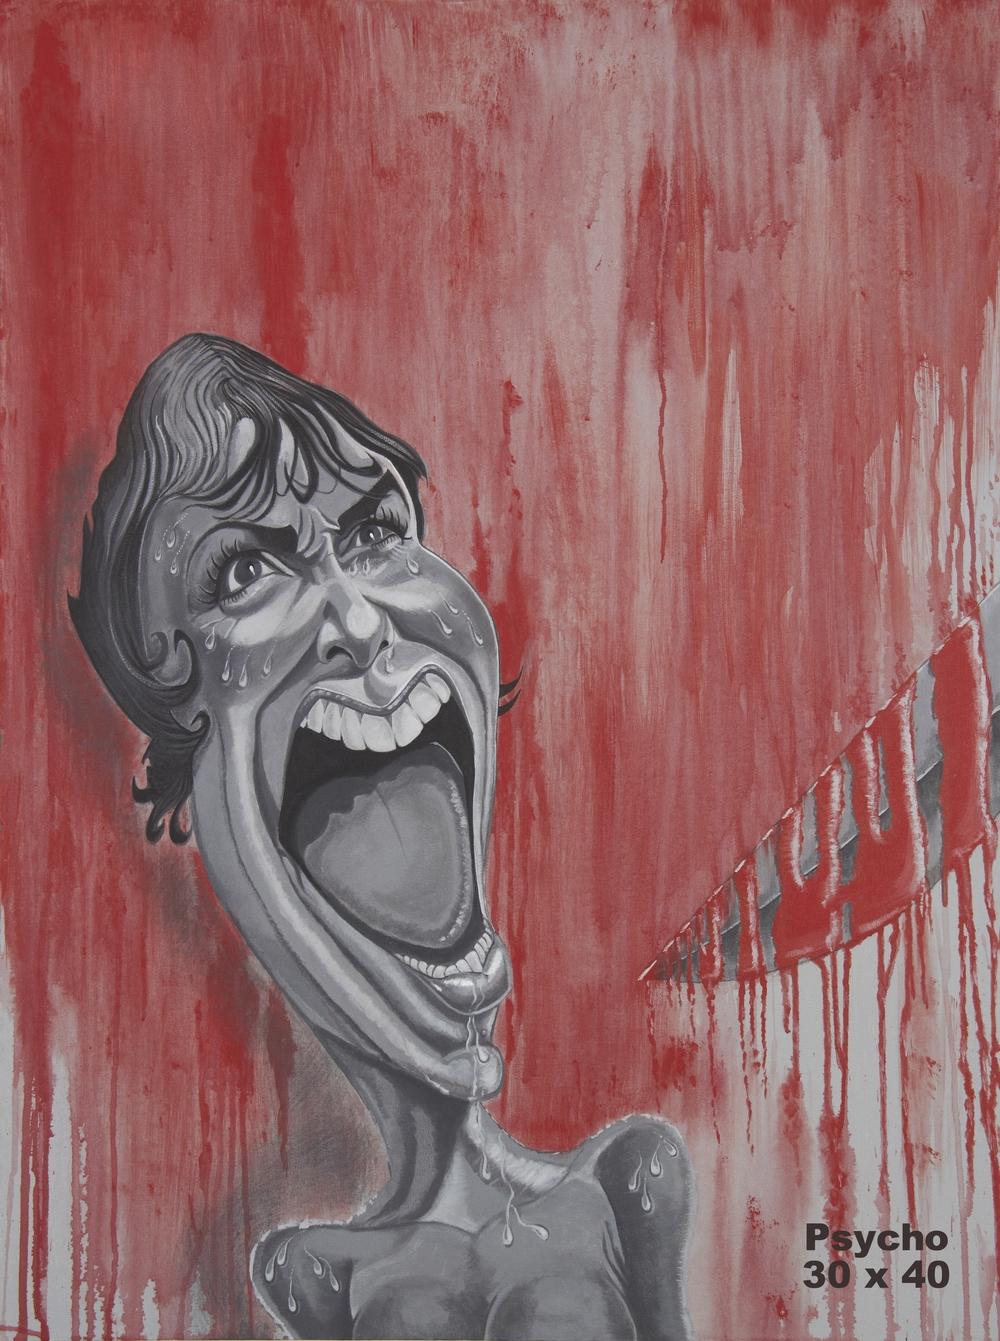 Tasiir Final Psycho IMG_068102.jpg